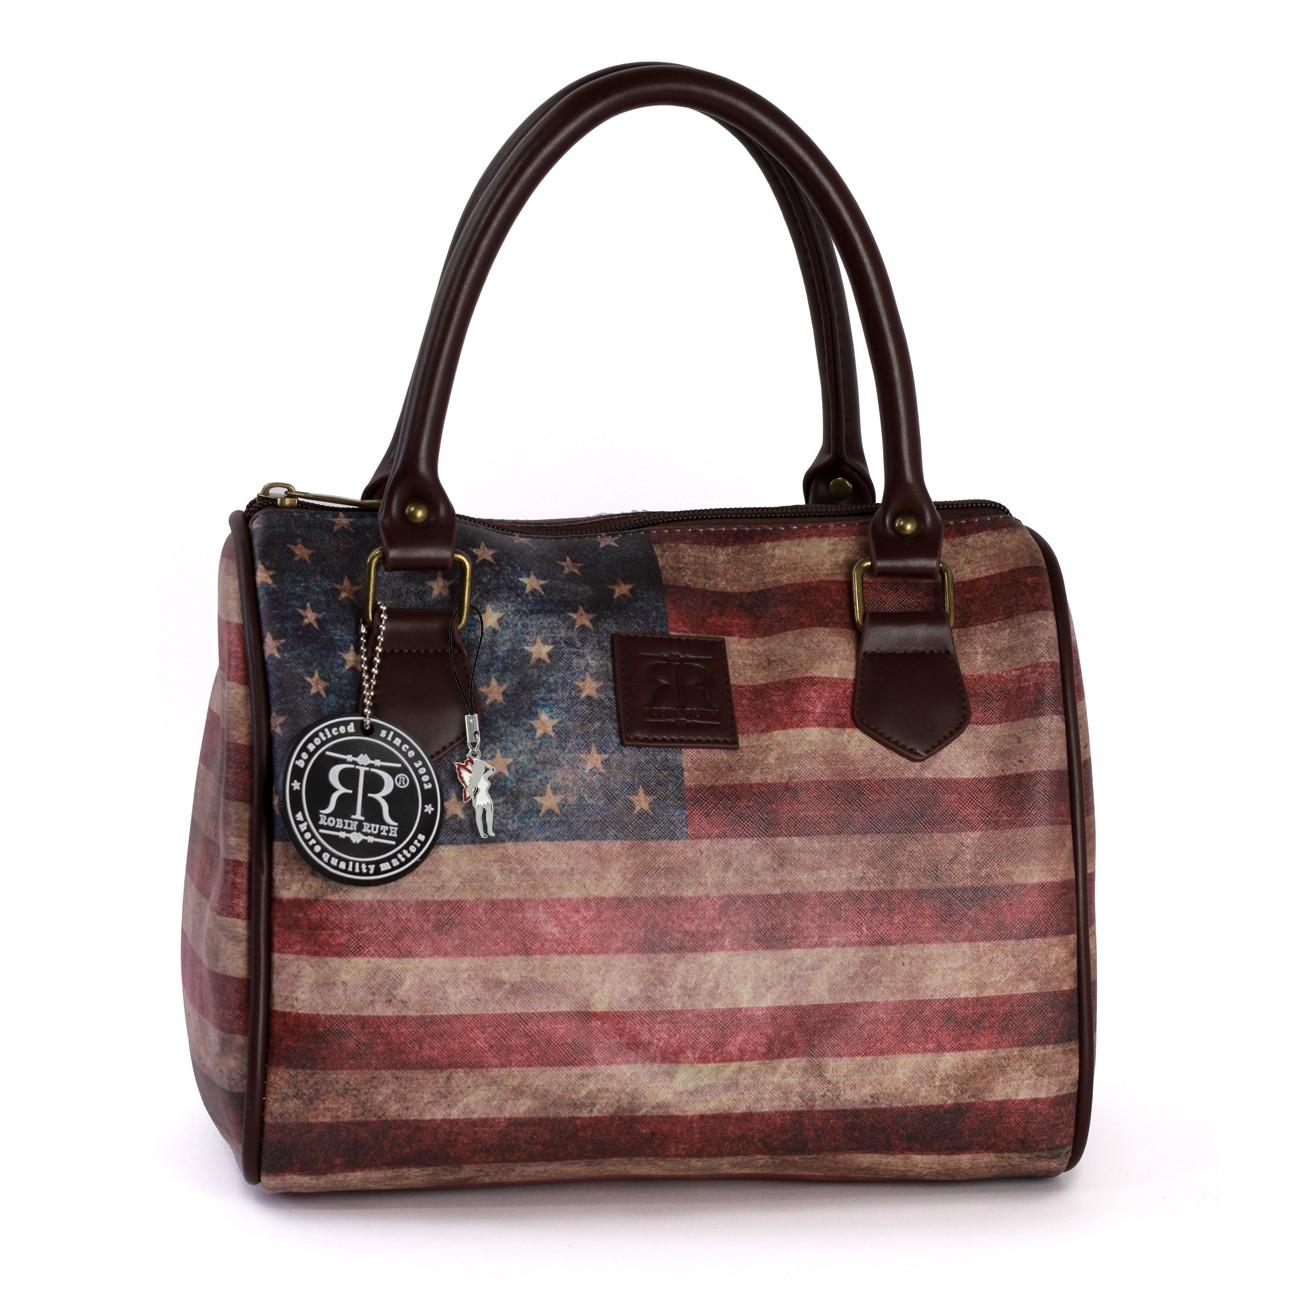 Robin-Ruth Handtasche Kunstleder mehrfarbig Elegante Vintage USA Tasche OTG103F